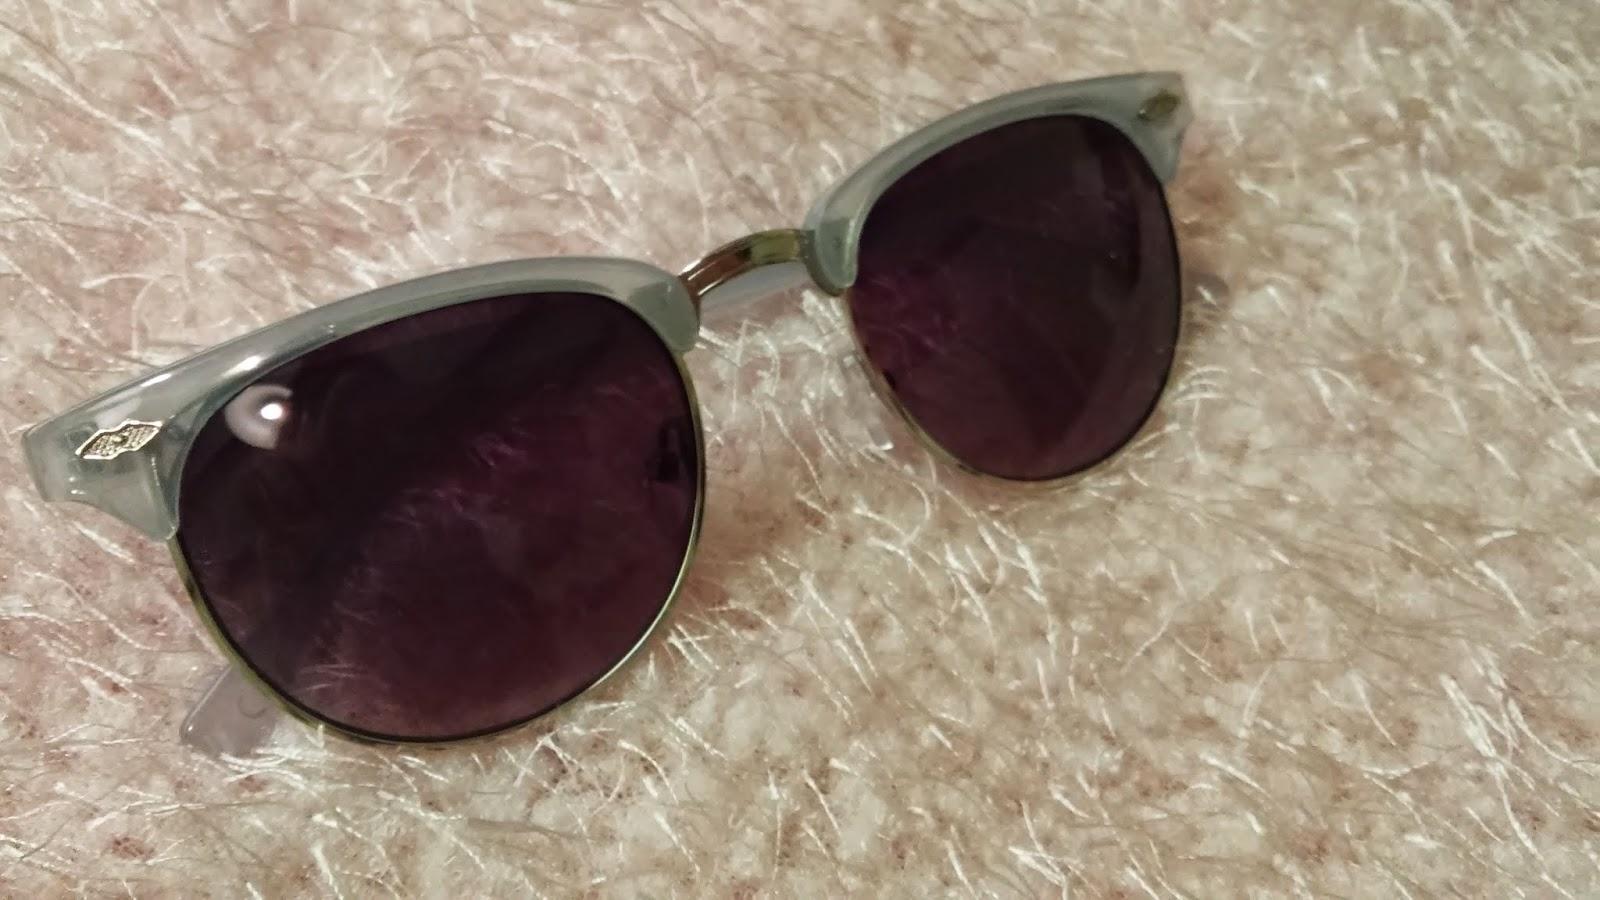 http://www.newlook.com/shop/womens/accessories/light-blue-tortoiseshell-half-frame-retro-sunglasses-_330868940